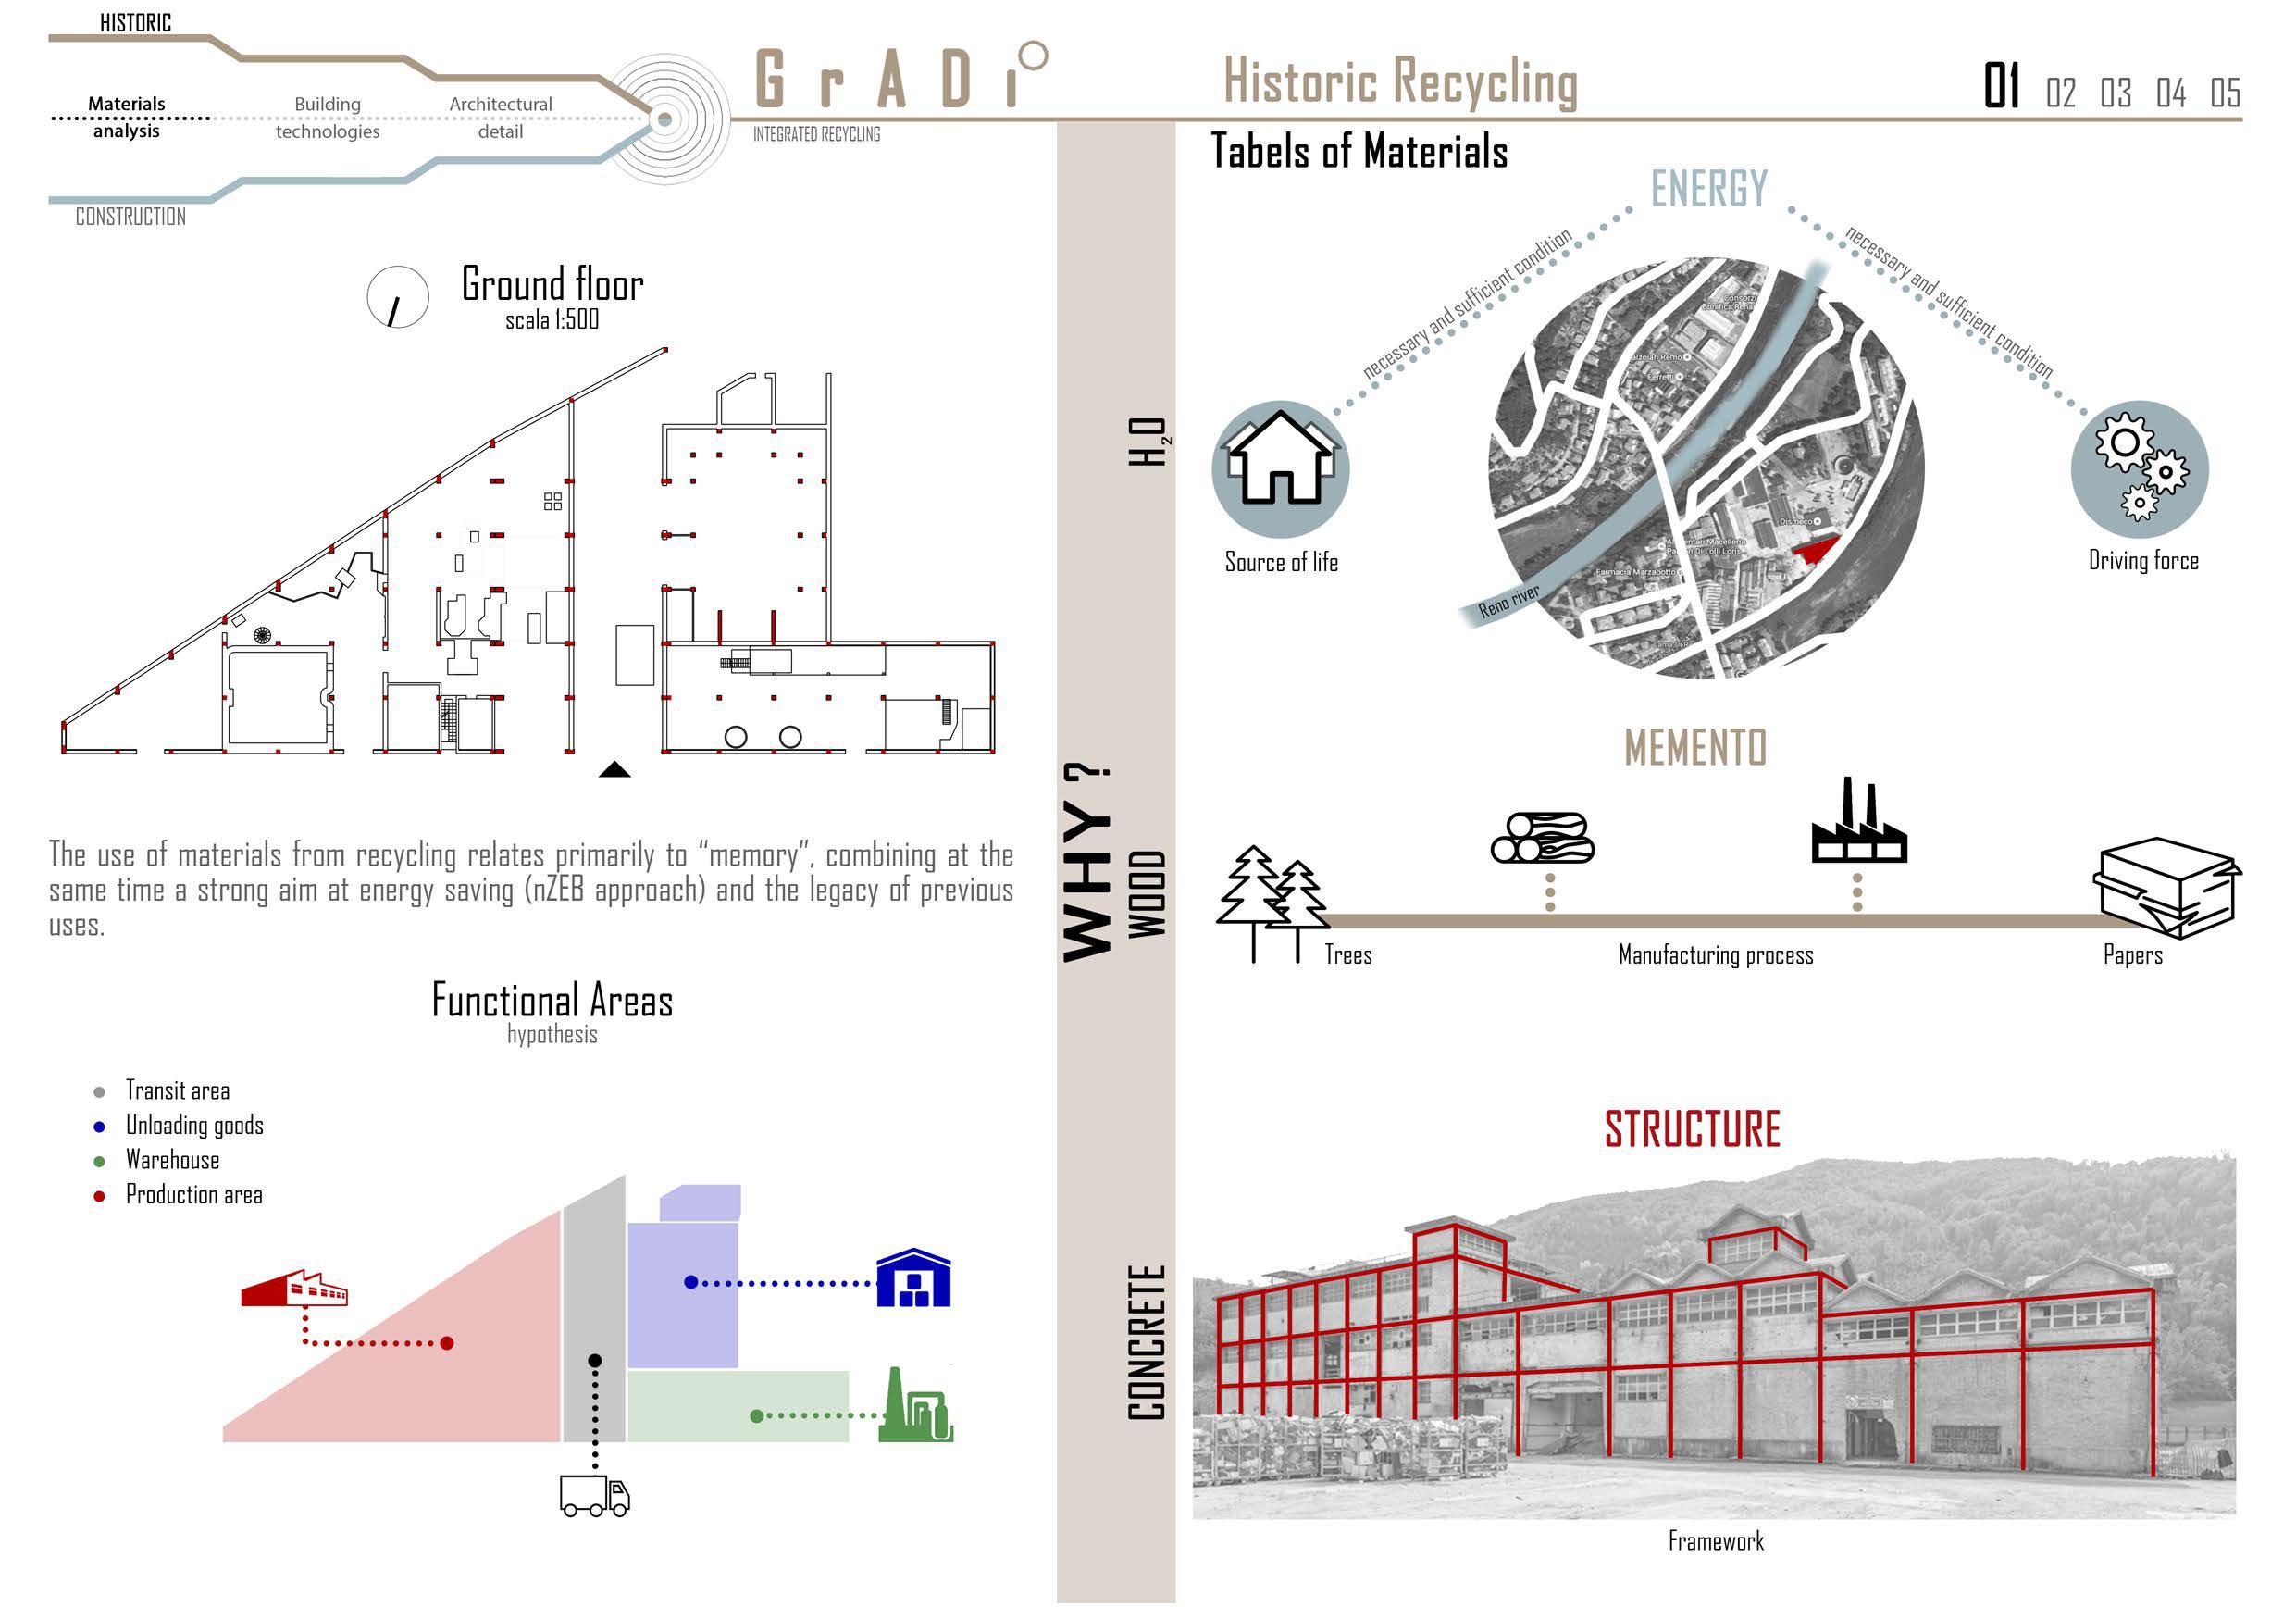 Folder - distribuzione funzionale e struttura